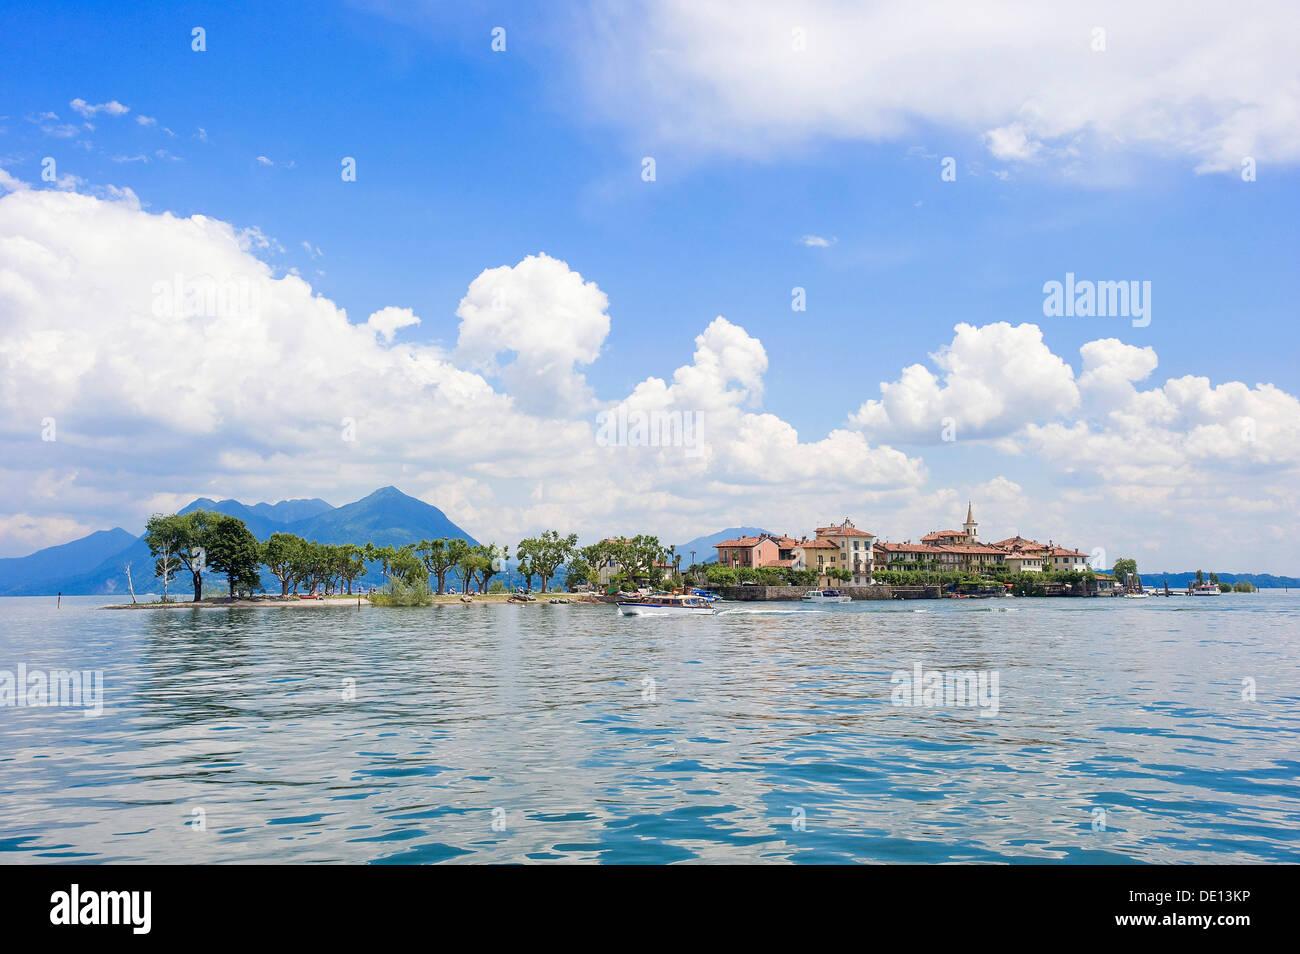 Isola Superiore, Lake Maggiore, Piedmont, Italy, Europe - Stock Image